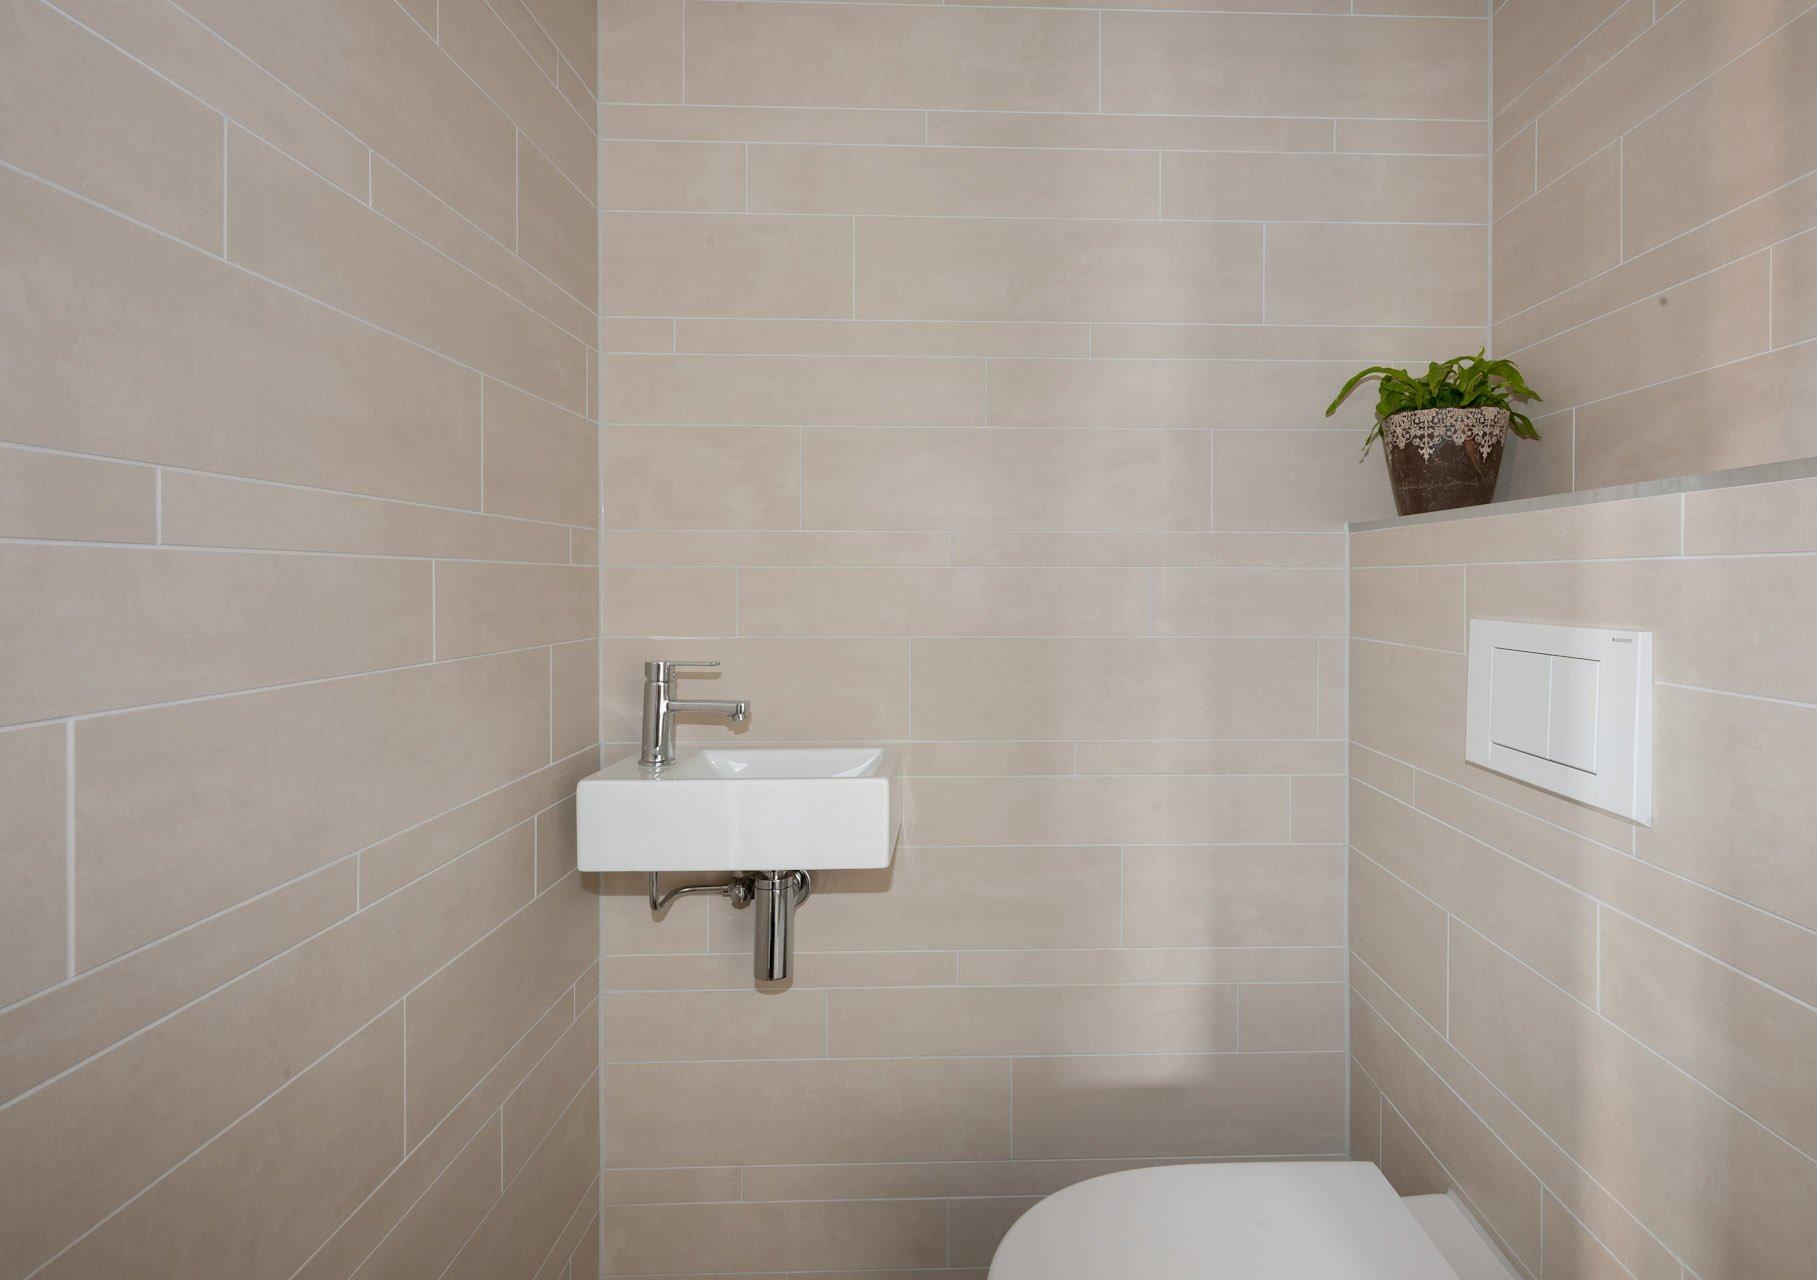 Grijze Vloertegels Badkamer : Tegels keuken zwart wit witte wandtegels